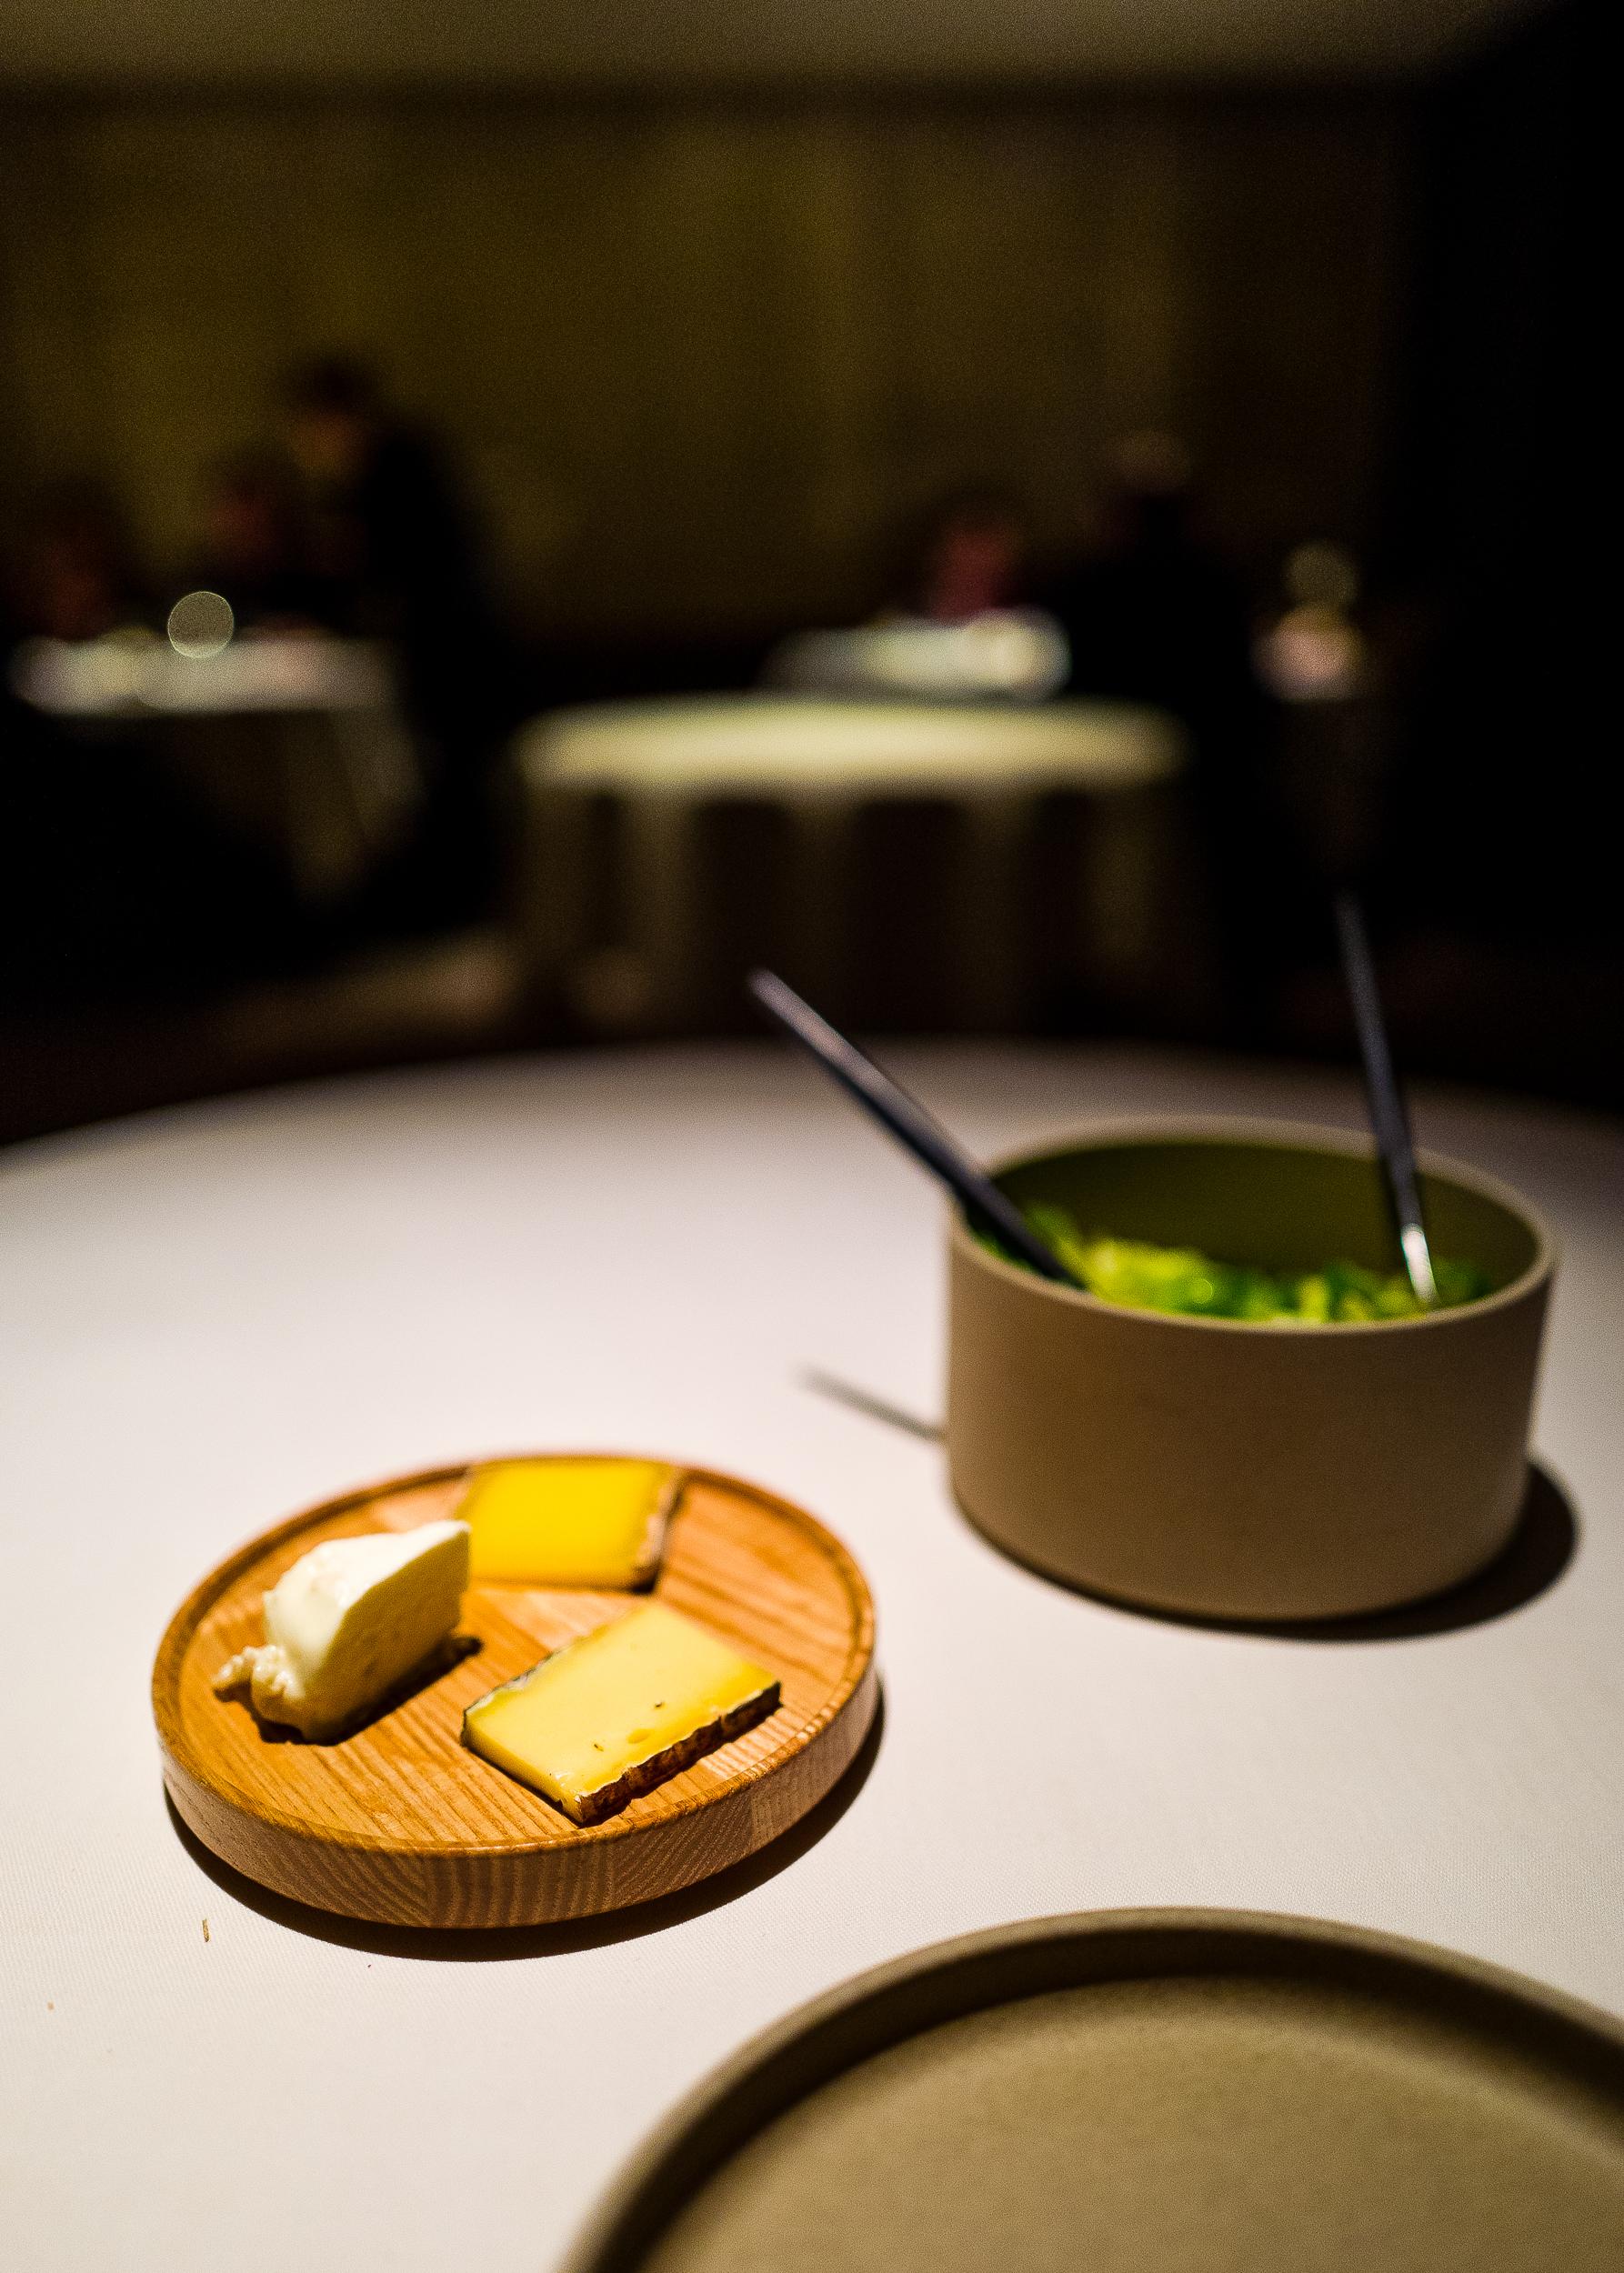 Bernard Antony's Cheeses, Green Salad, Bread Toast